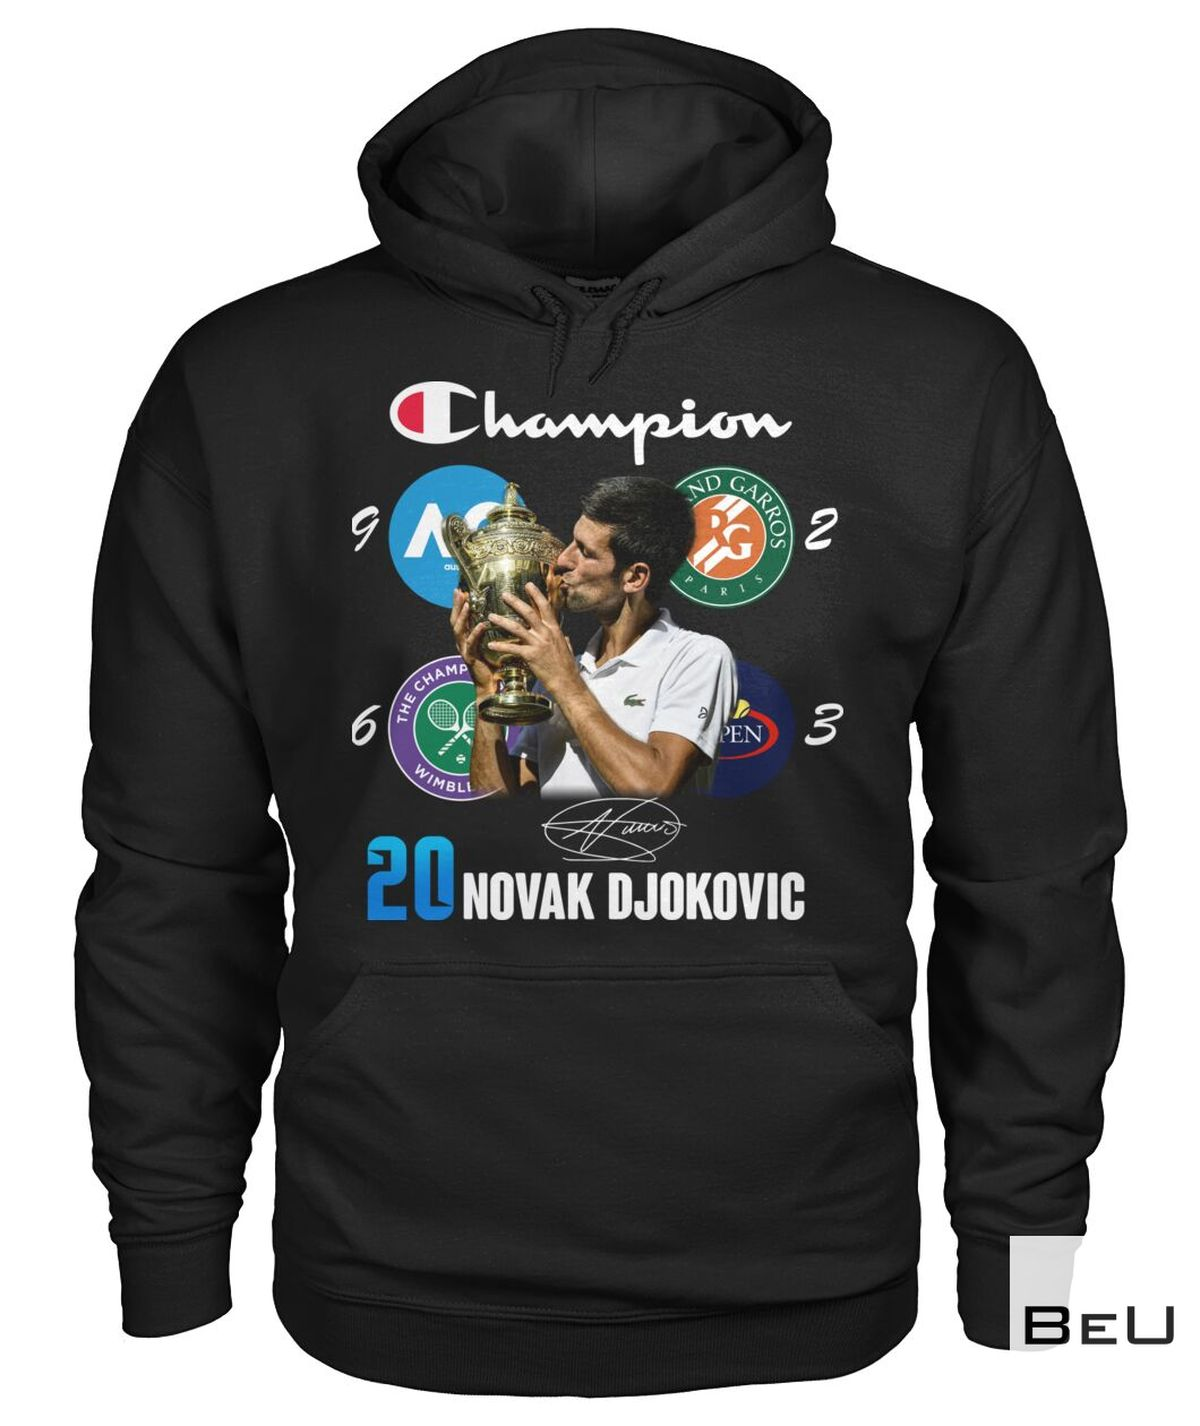 20 Novak Djokovic Champion Shirtz